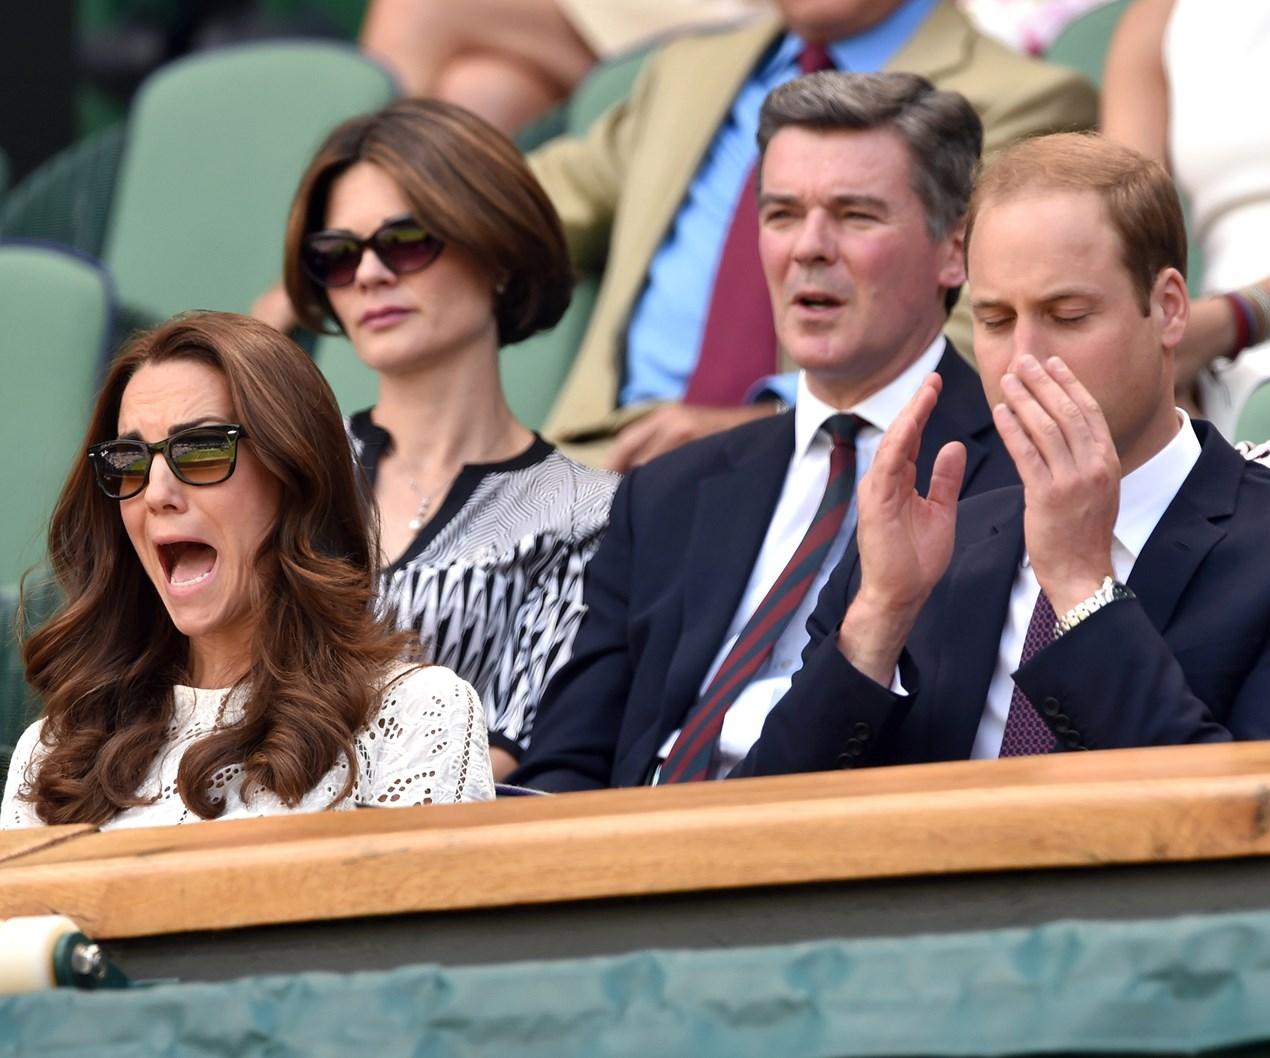 Royals get worked up at Wimbledon